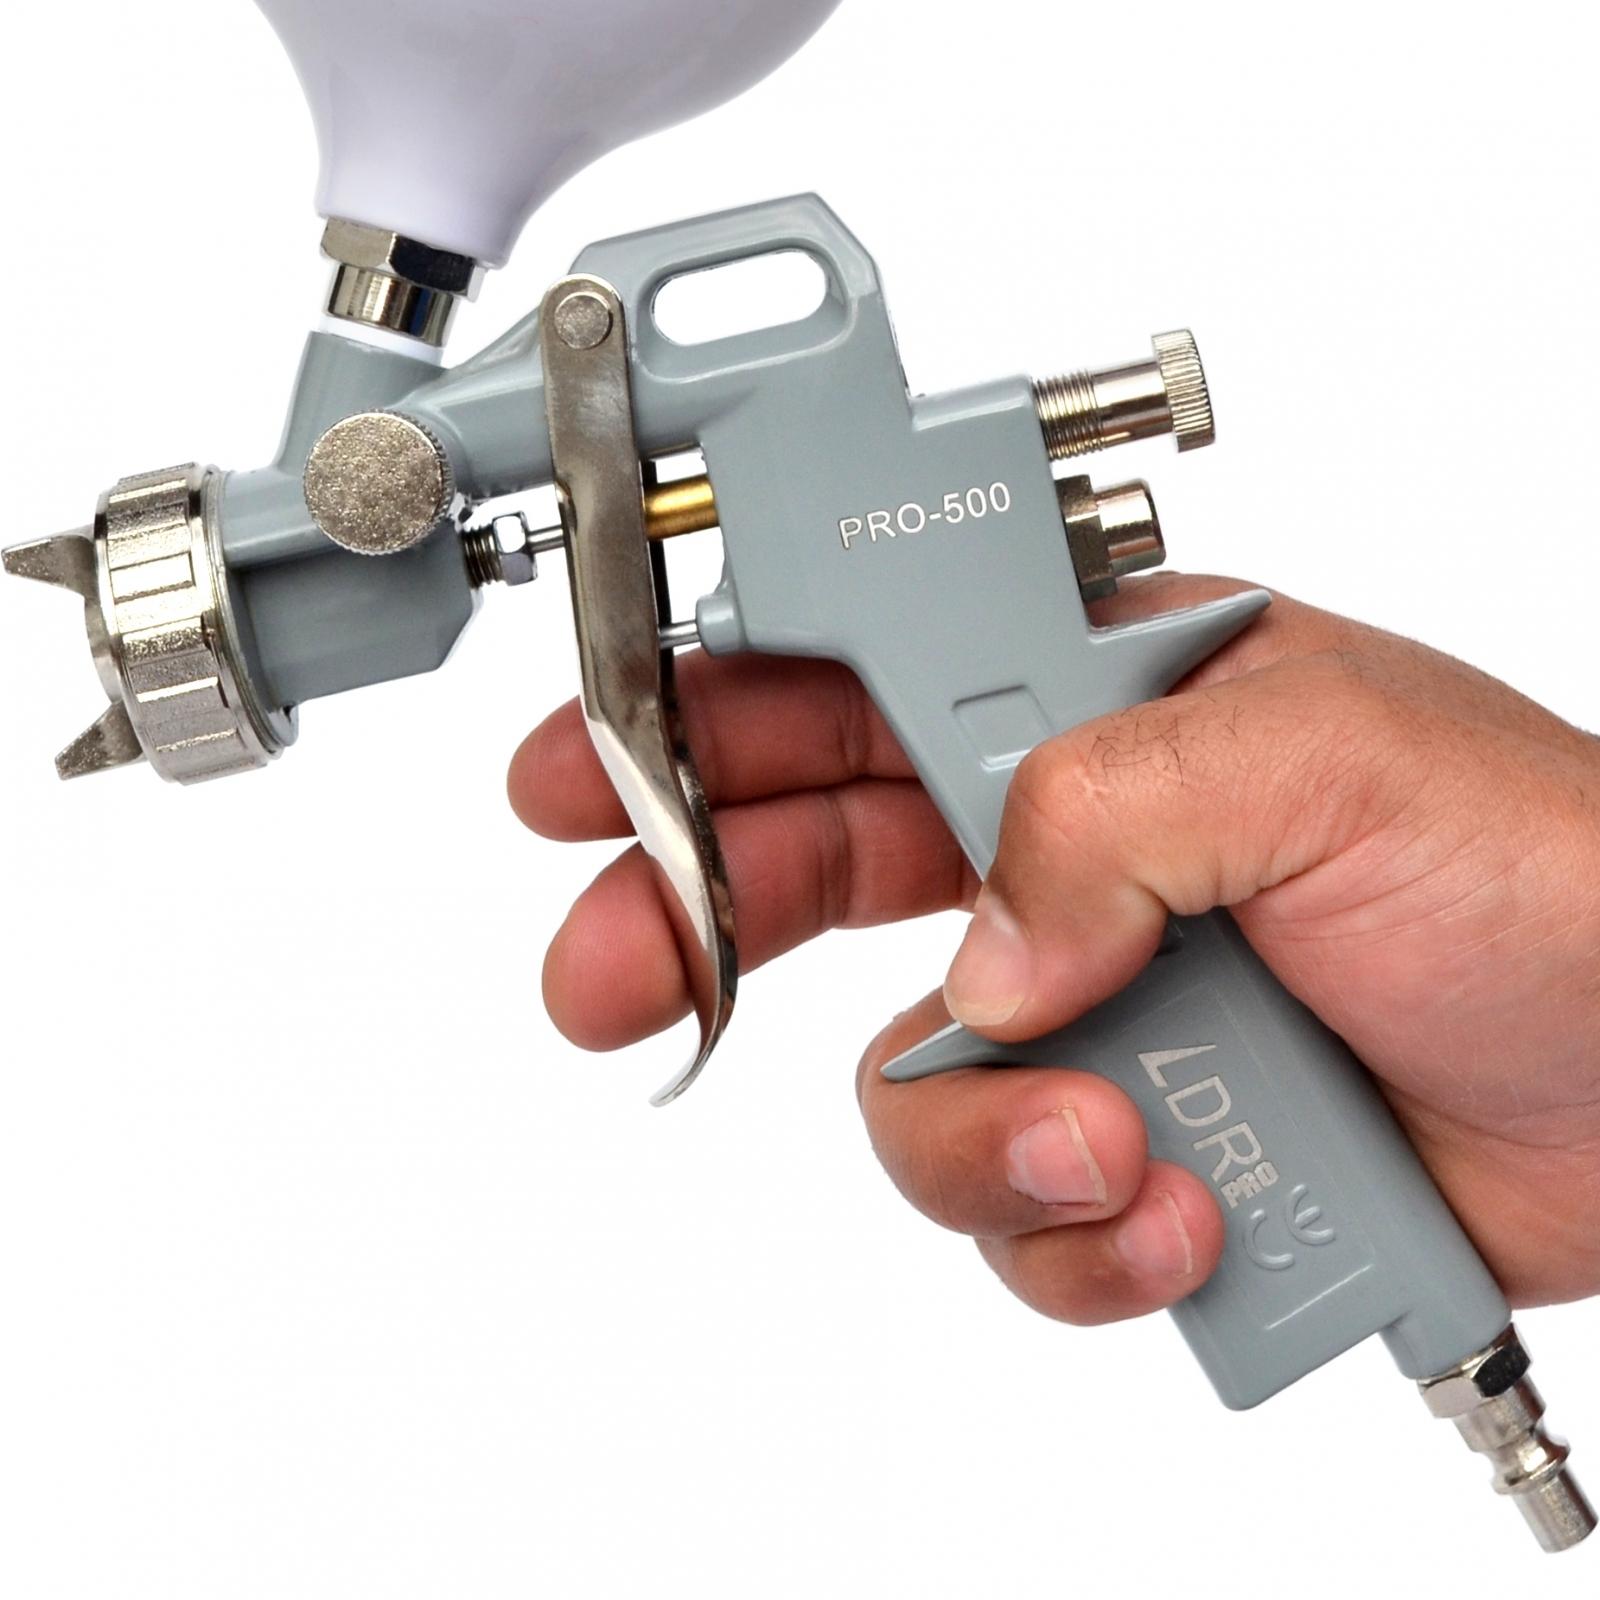 Pistolas De Pintura Pdr - Pro 550 Bico 1,4 Hvlp  + Pro 500 Bico 1,5 Gravidade Kp3 - Ferramentas MEP